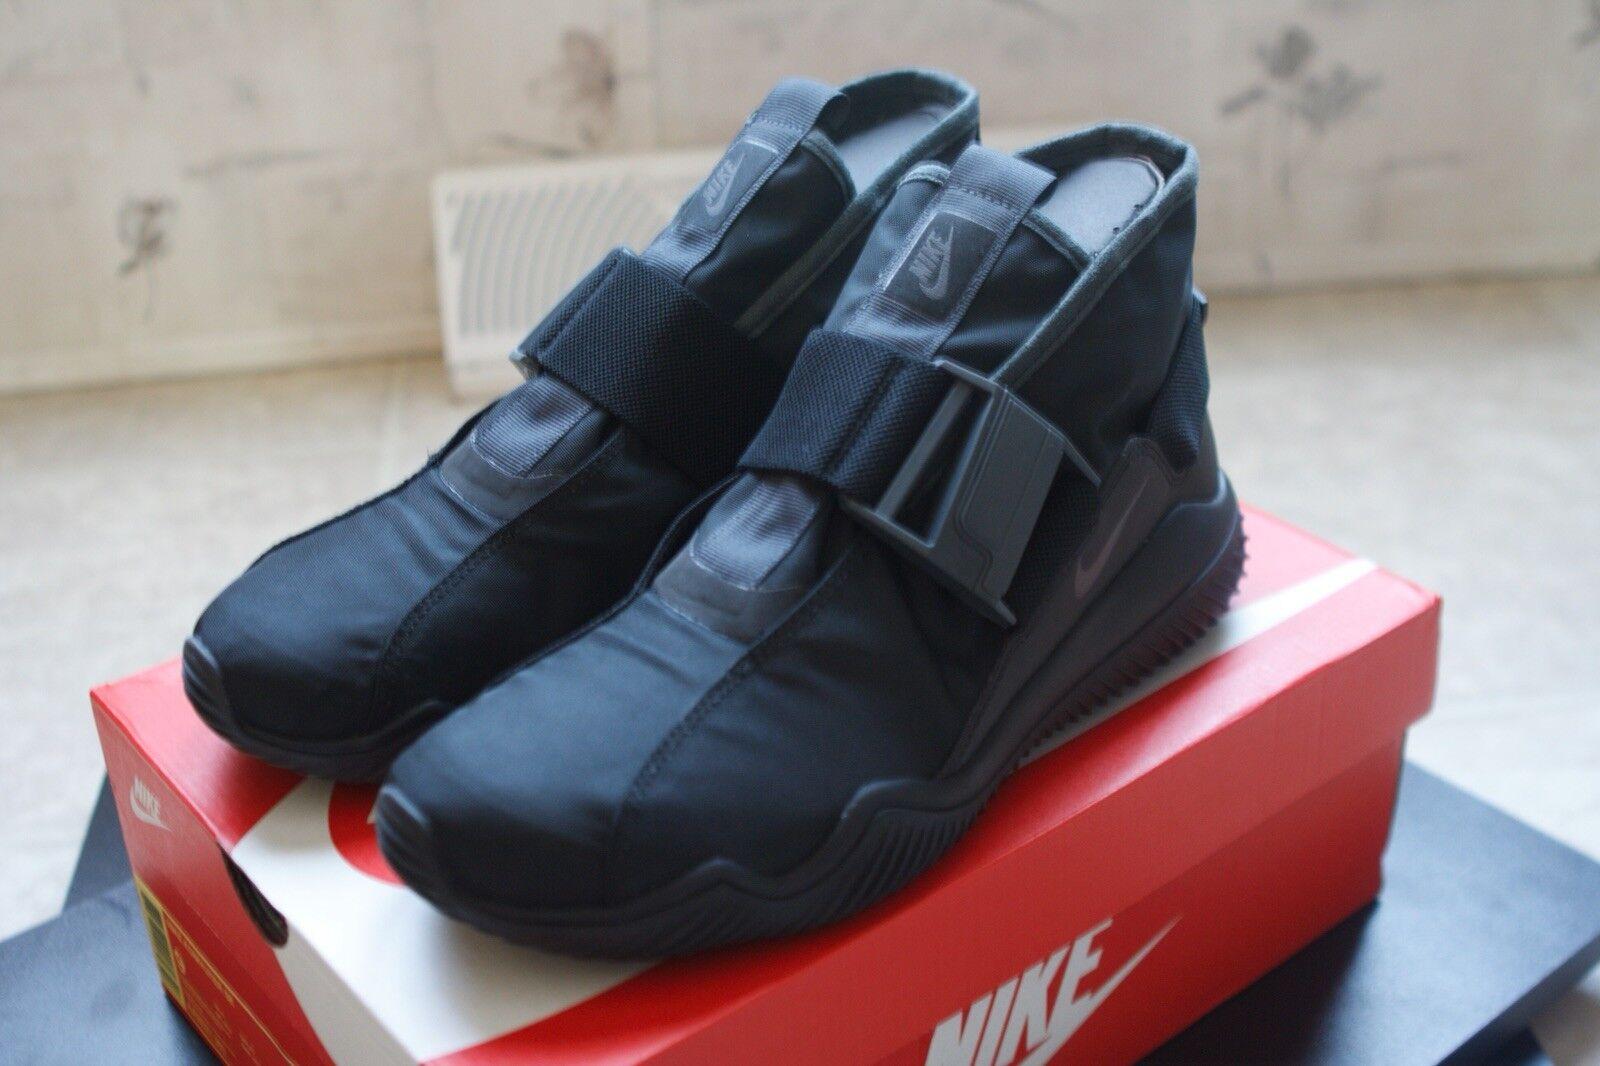 Nike 9 Komyuter SE Black/Anthracite SIZE 9 Nike AA0531-001 134e87